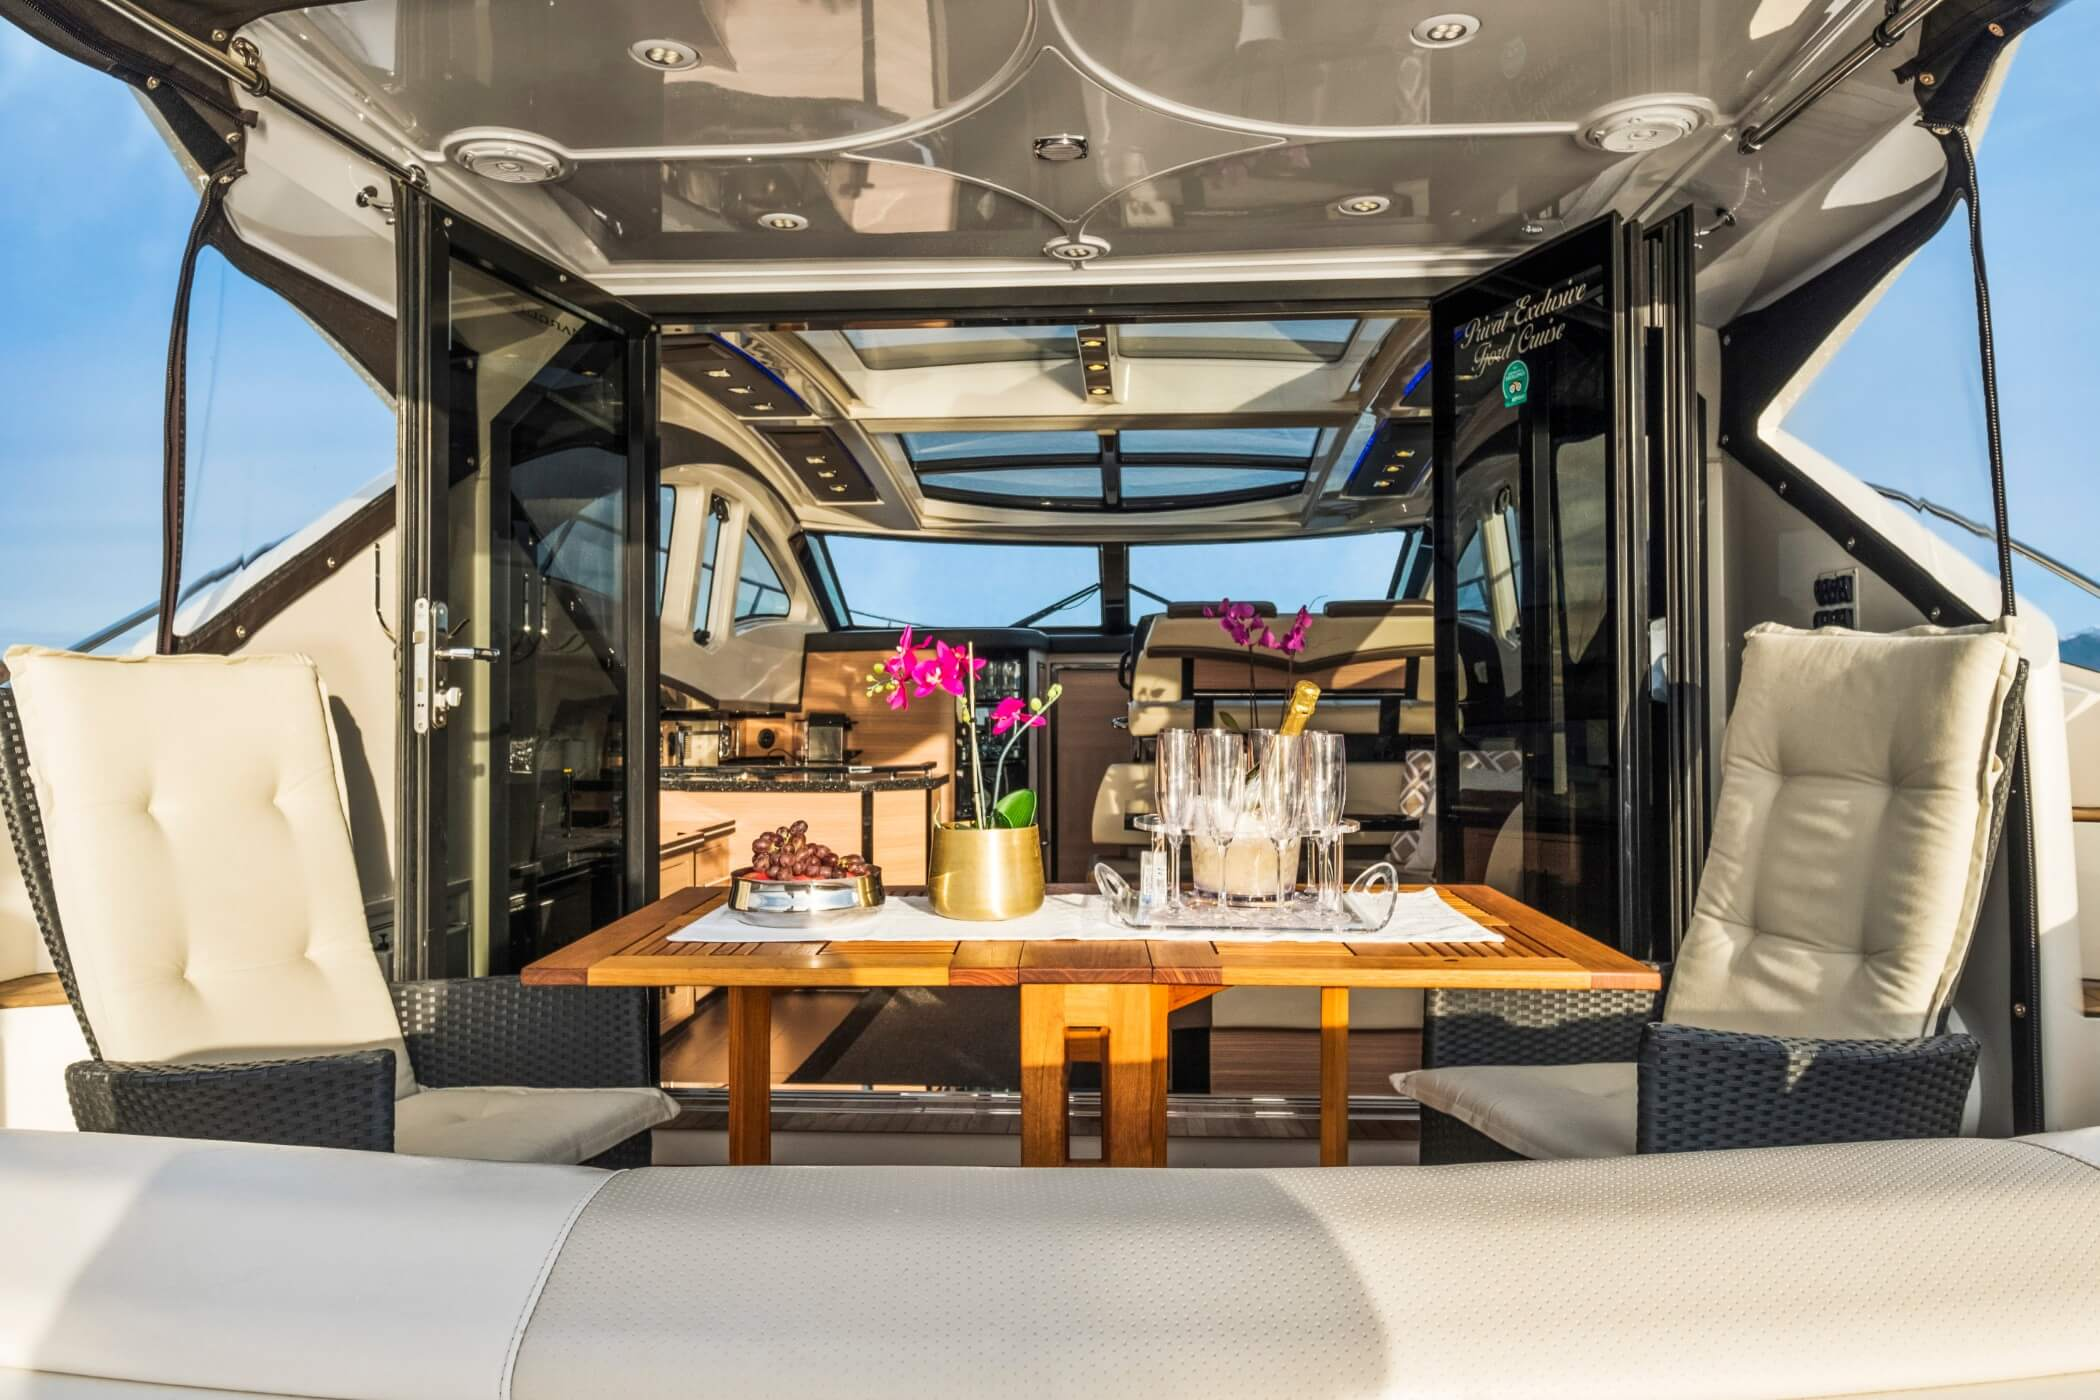 The boat PrivateCruise Stavanger 8